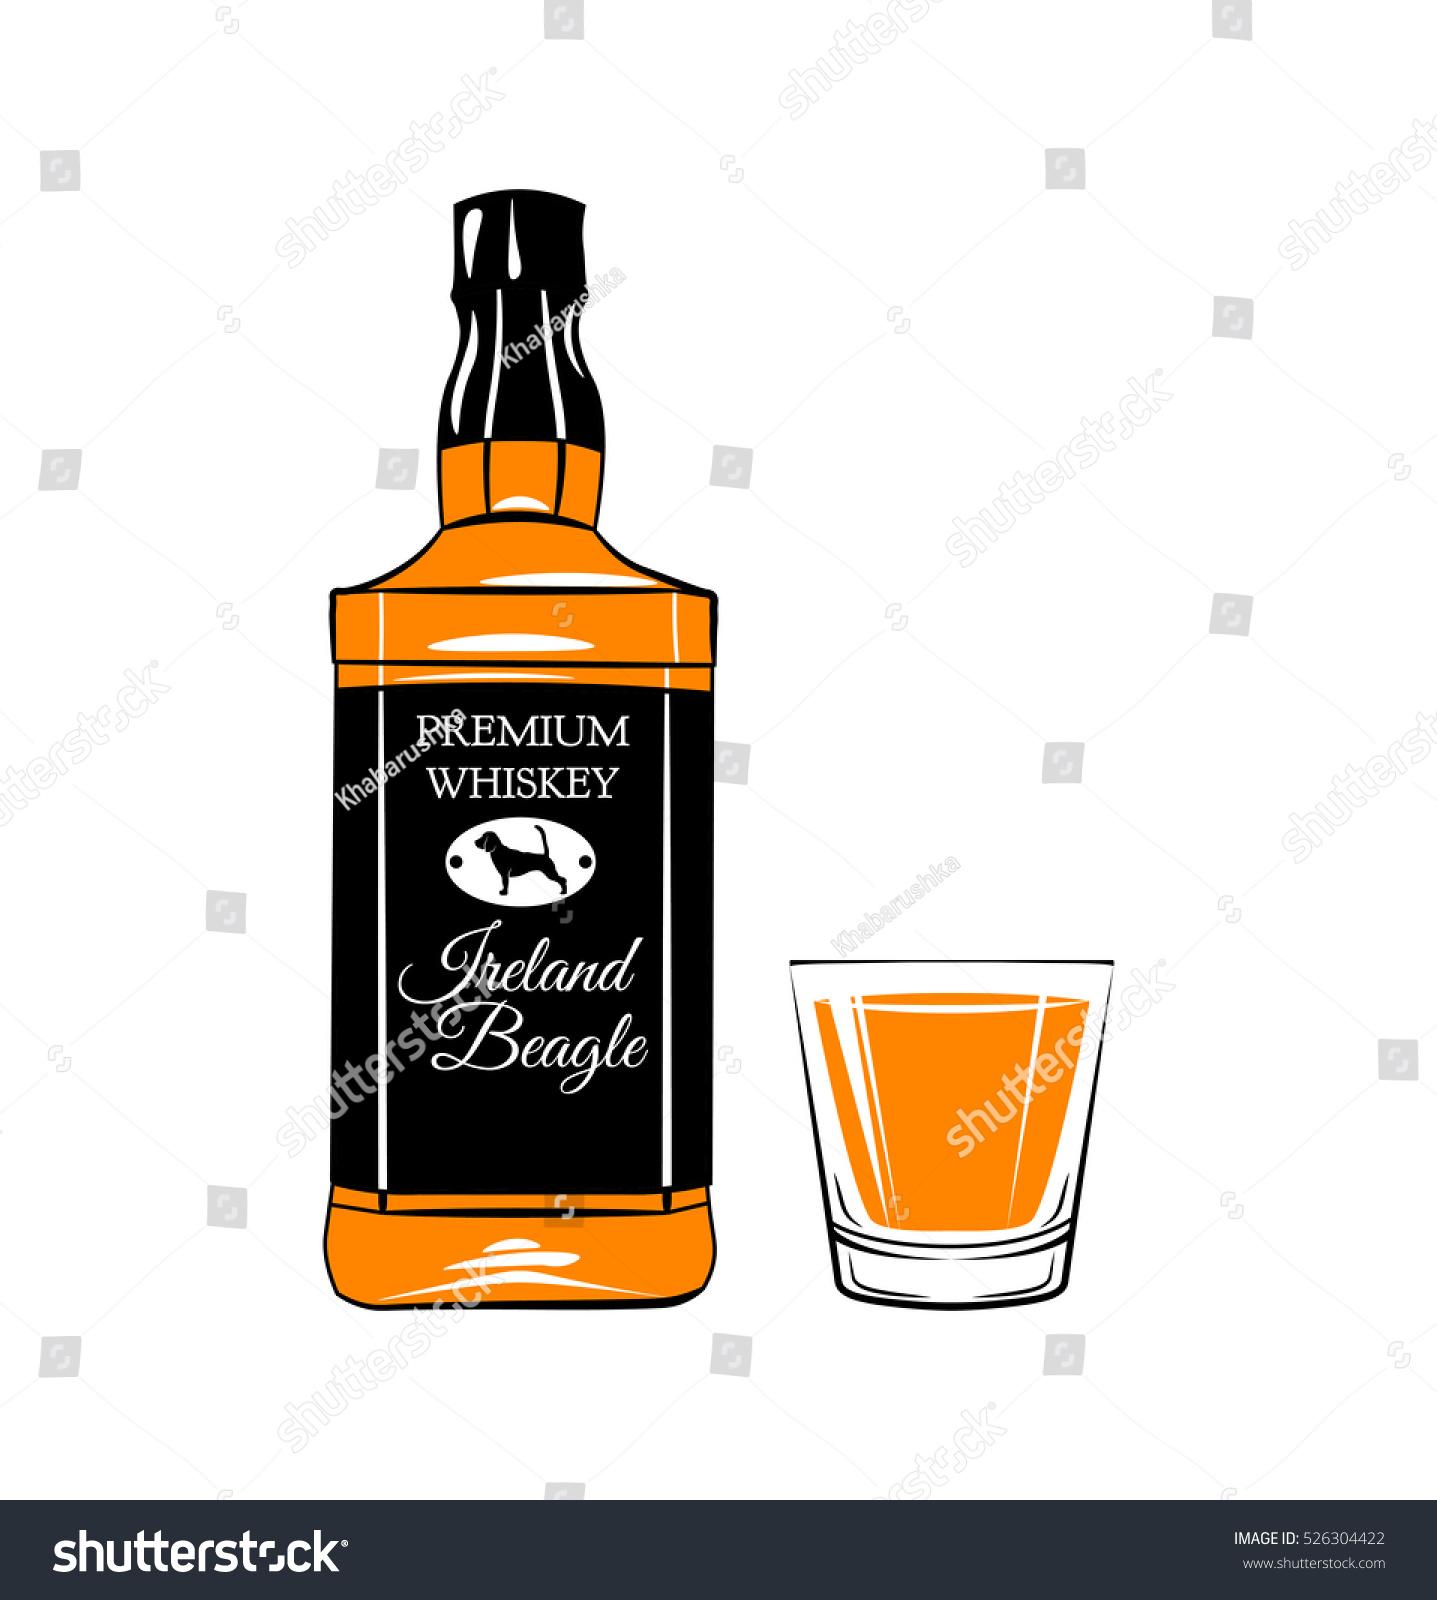 whiskey bottle shot glass alcohol drink stock vector royalty free rh shutterstock com jack daniels vector free jack daniels vector logo